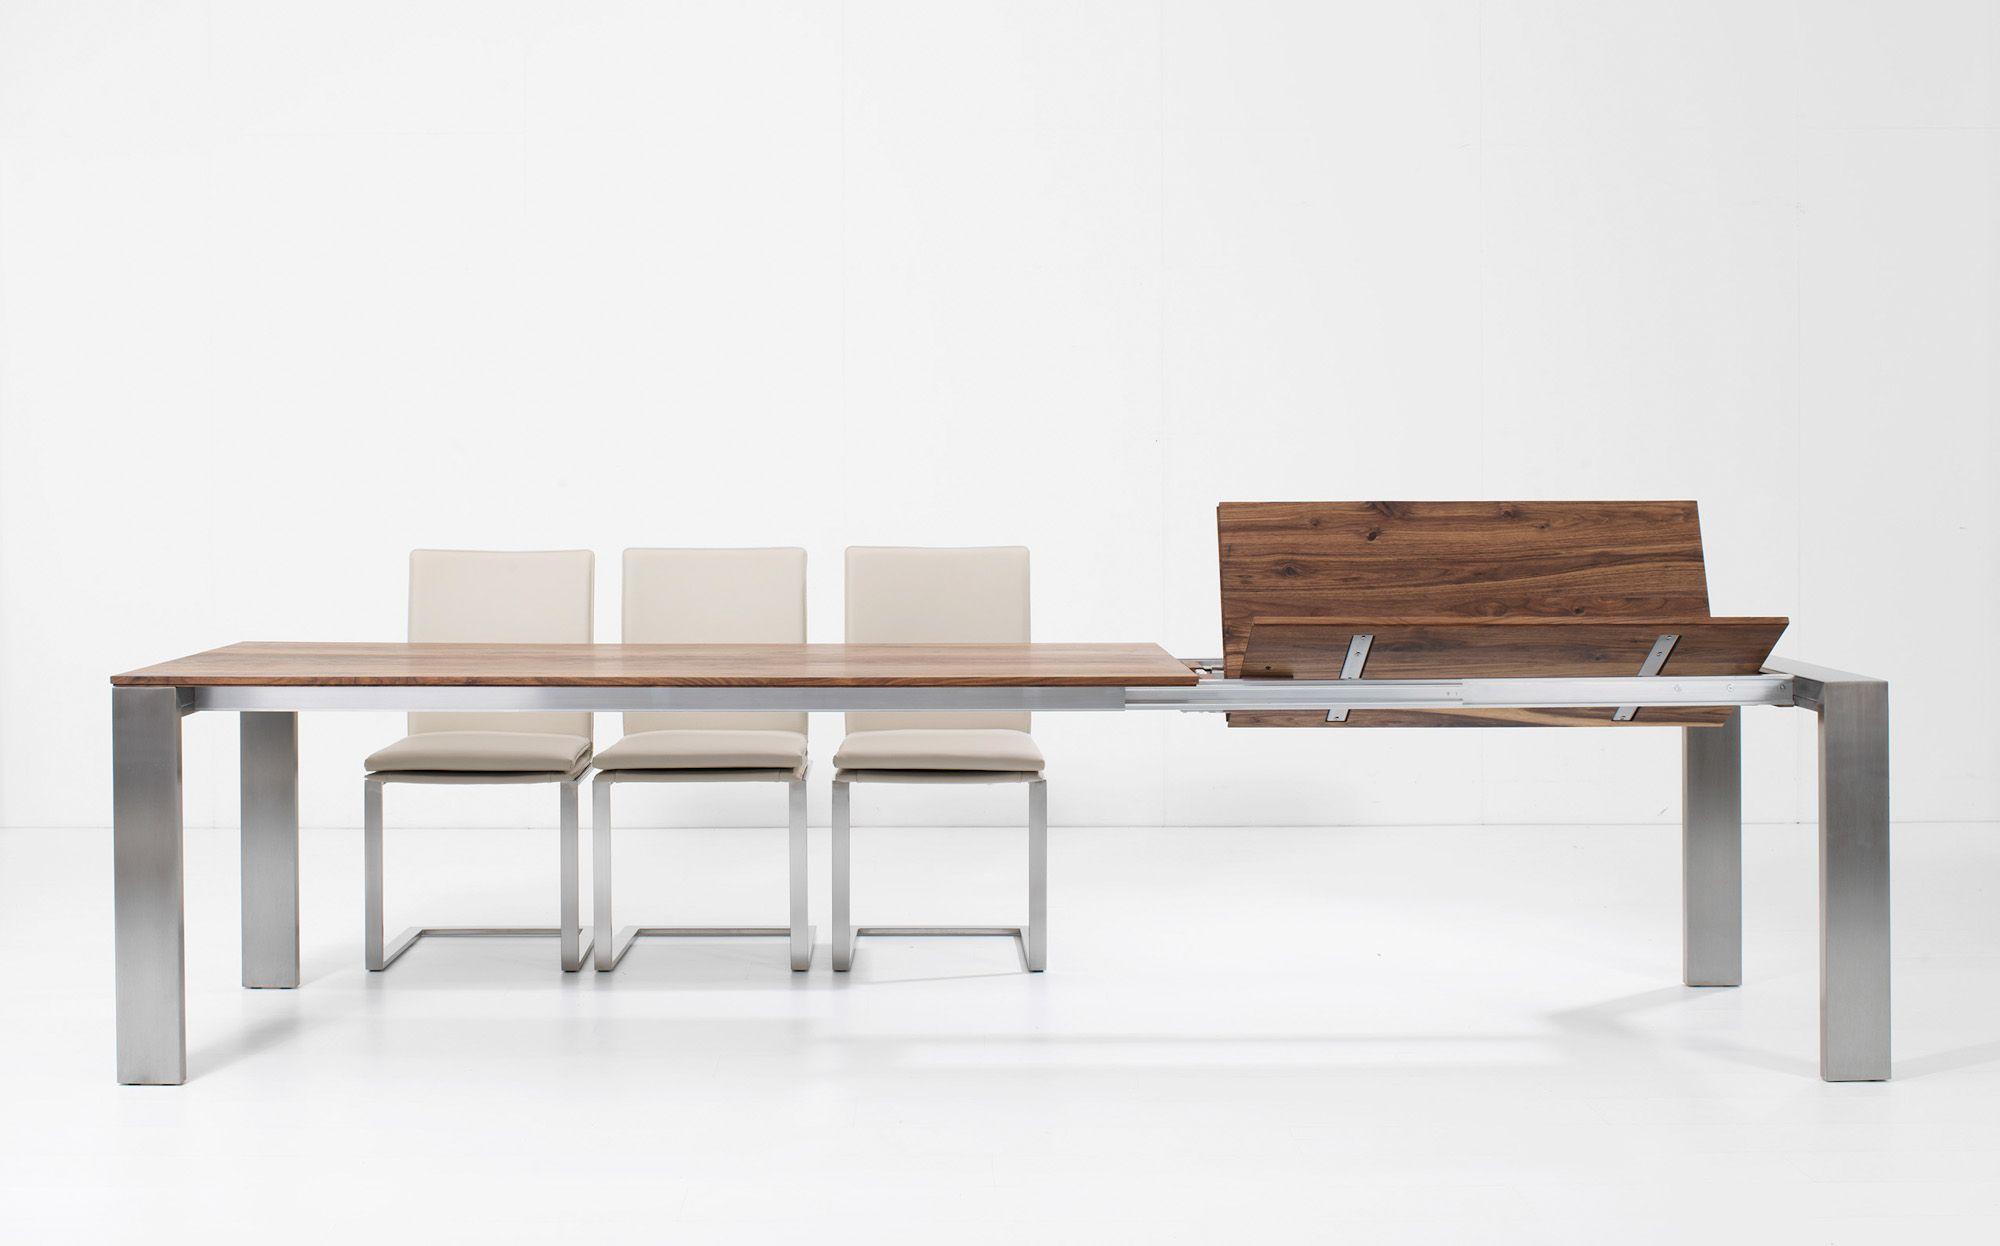 esstisch platte massivholz edelstahlgestell ausziehbar bei m bel morschett essen. Black Bedroom Furniture Sets. Home Design Ideas